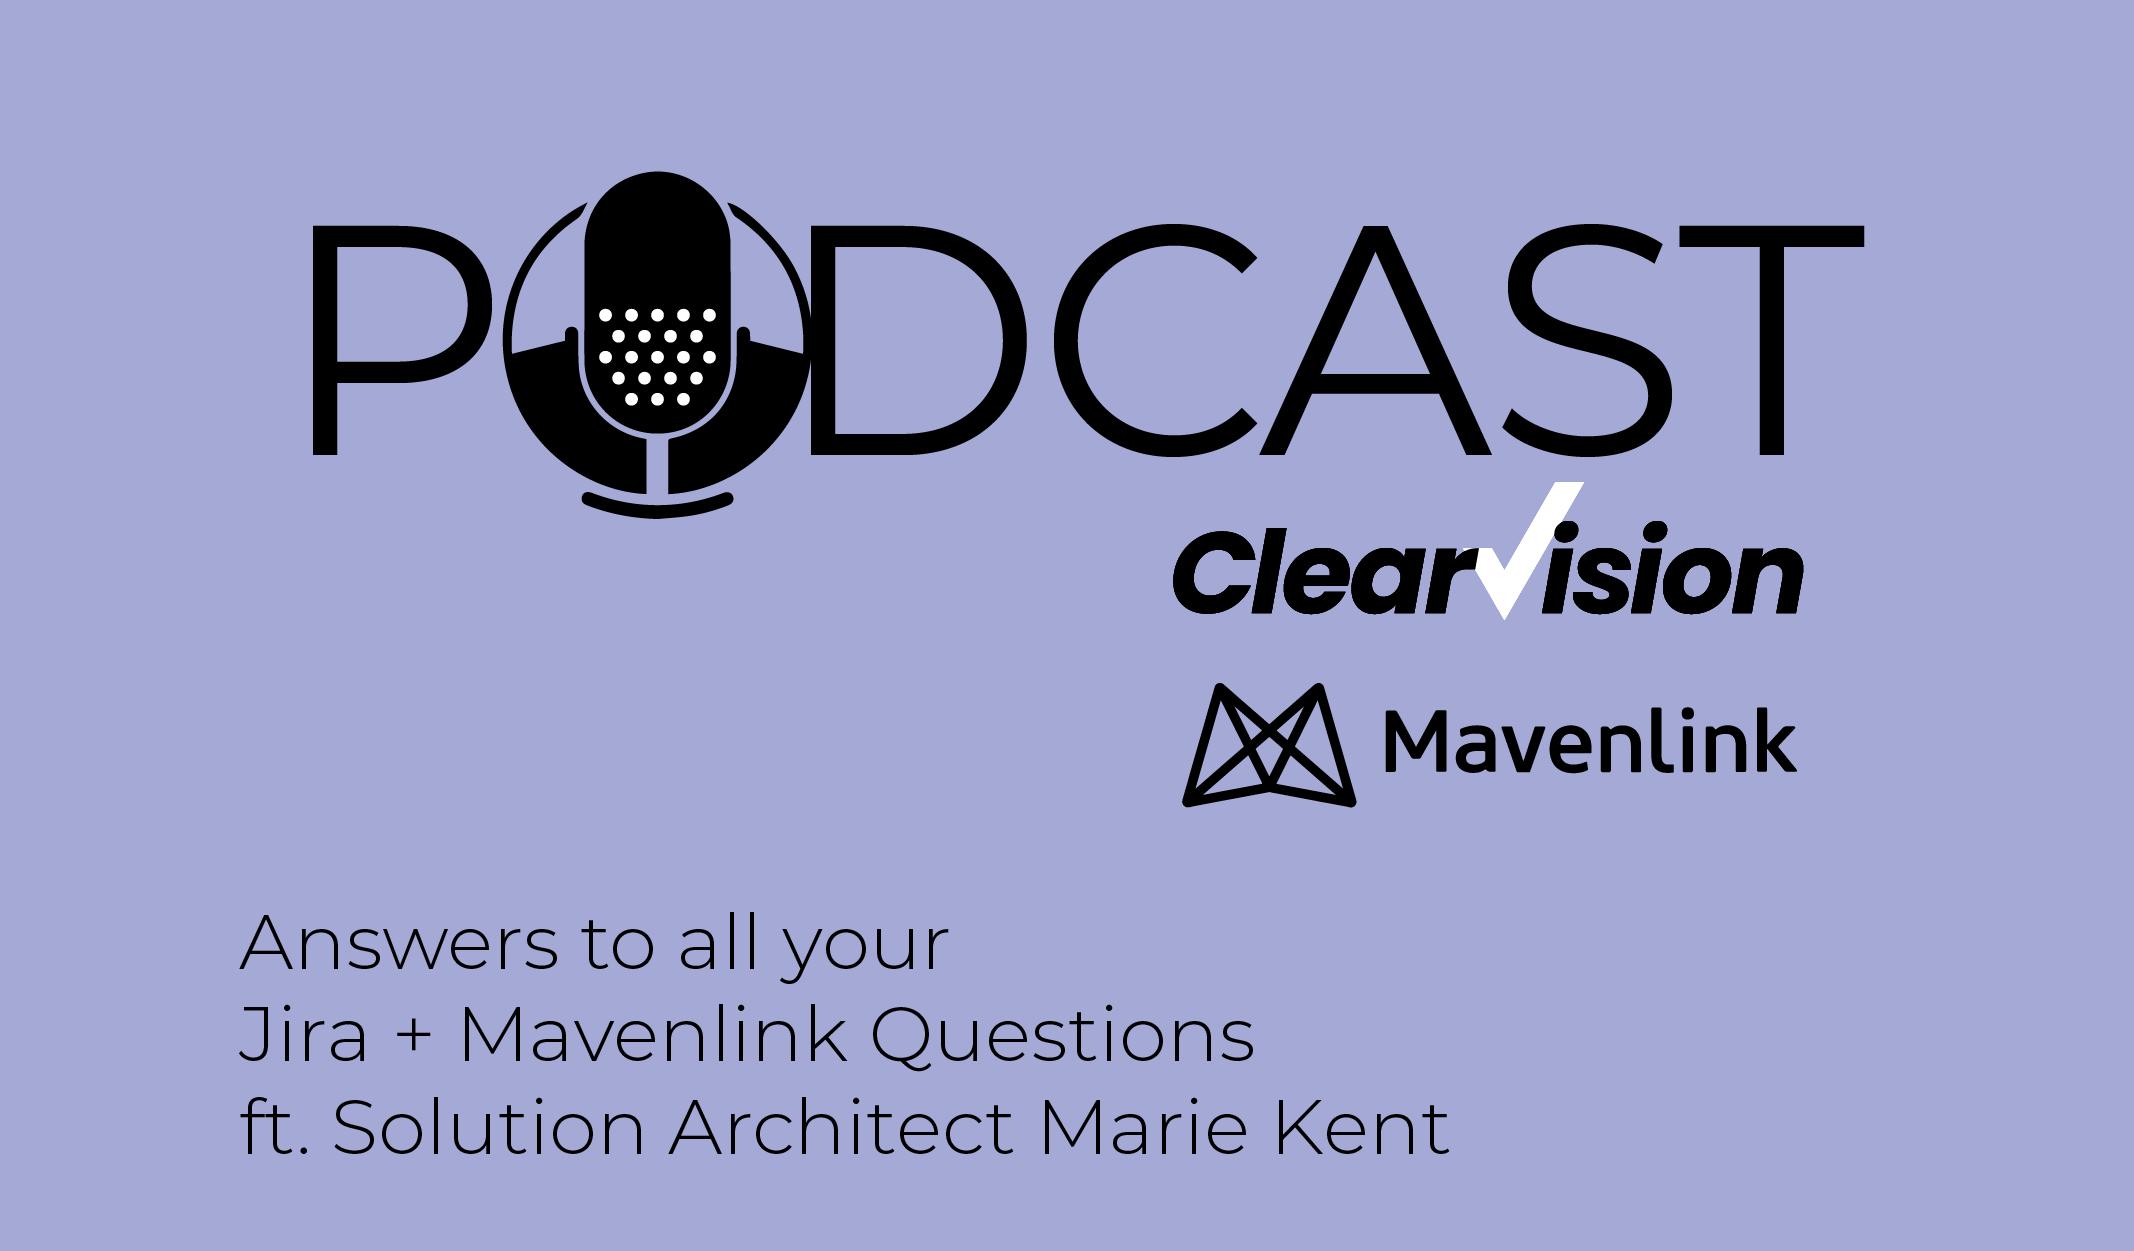 Mavenlink Podcast